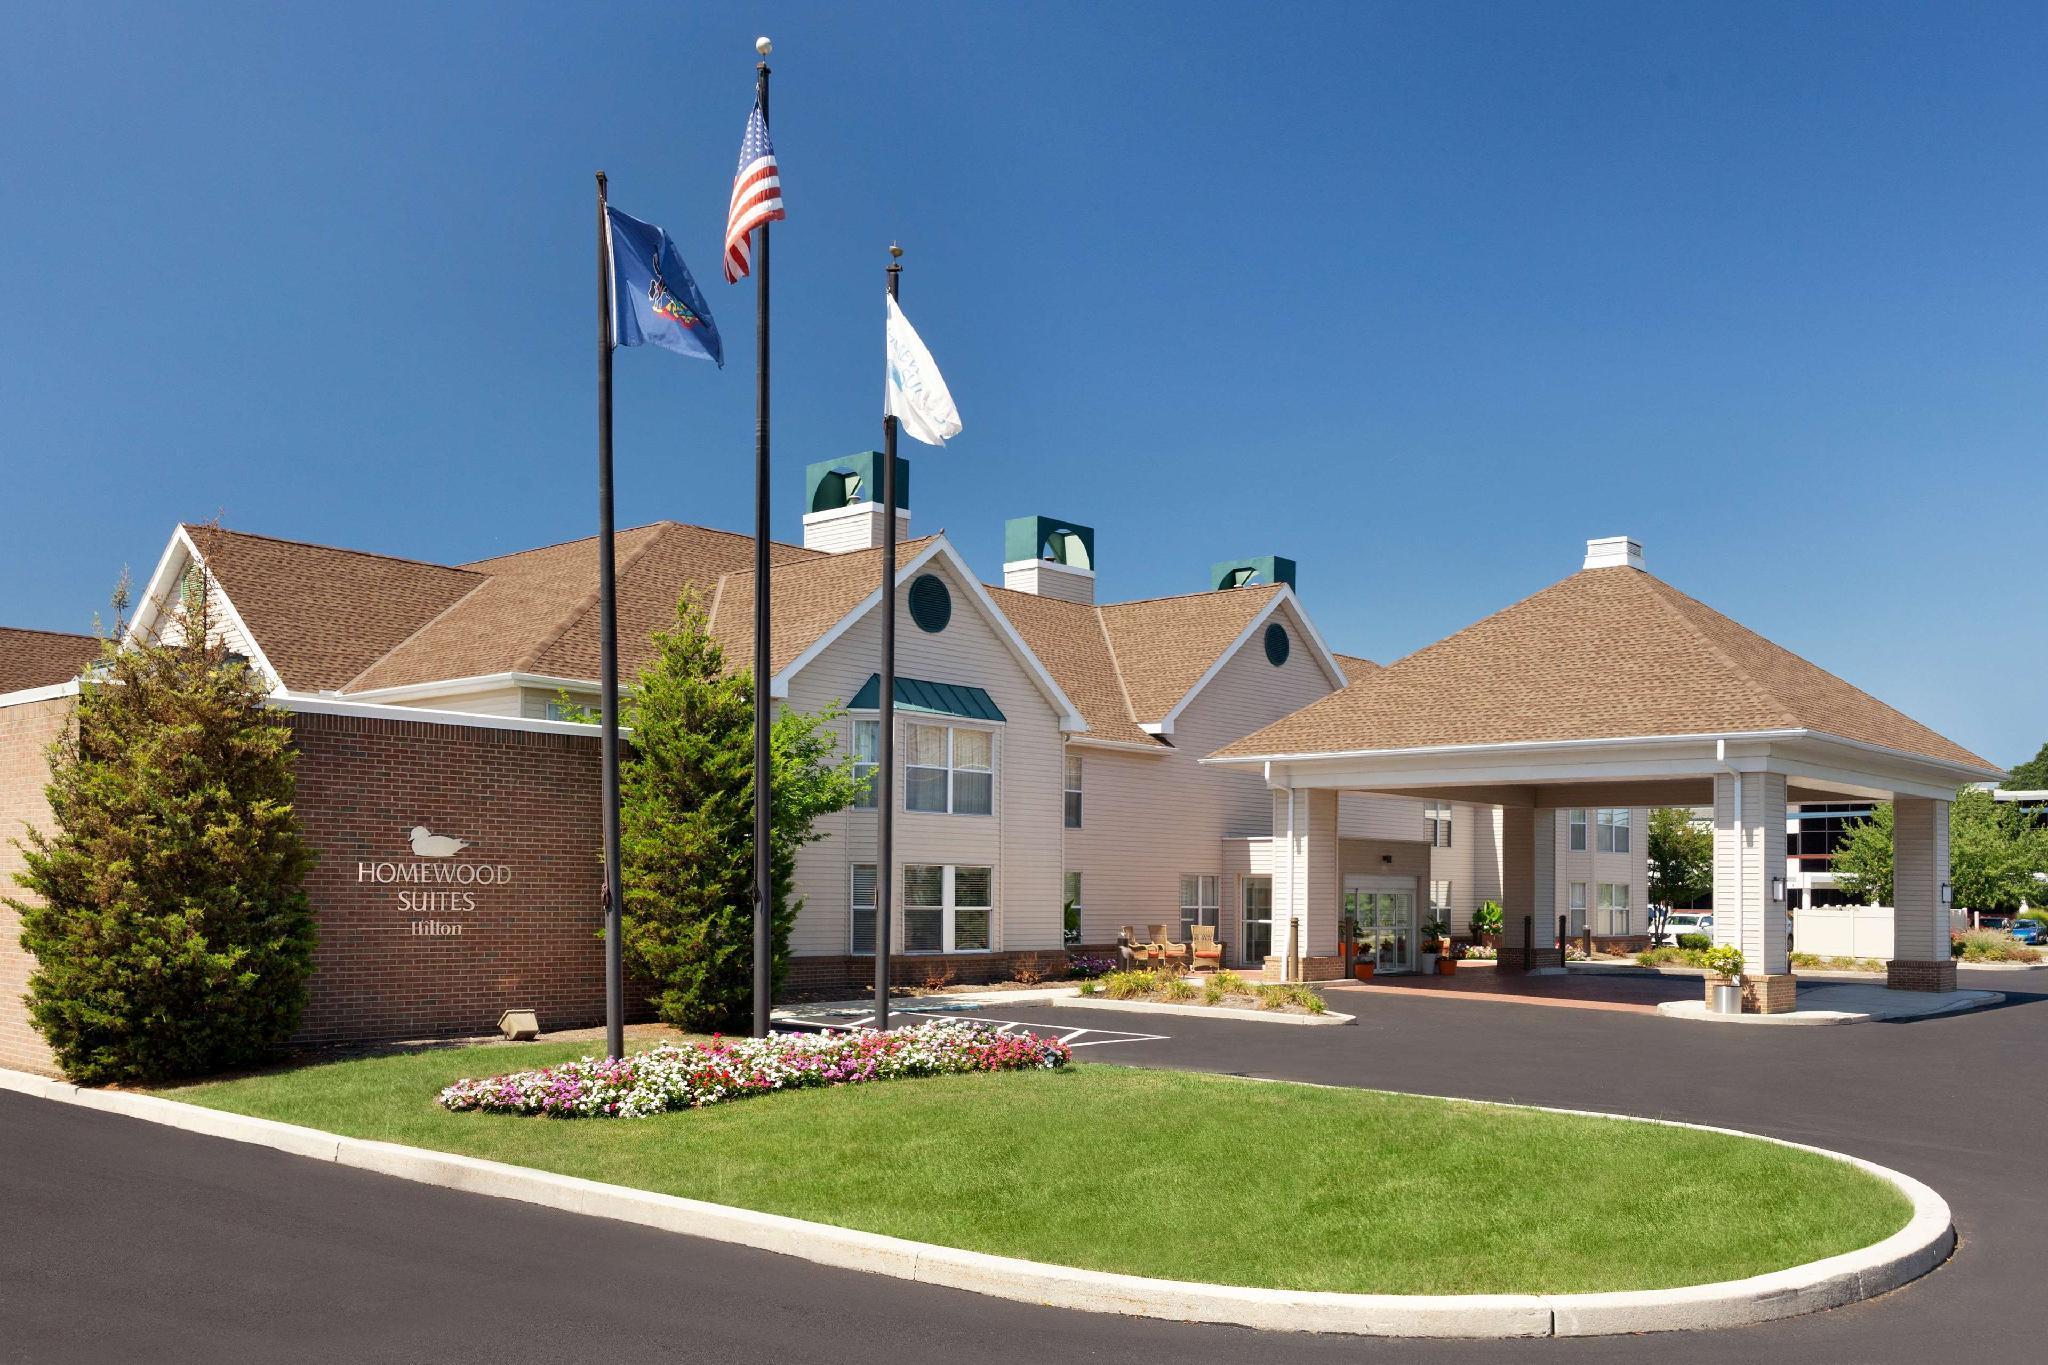 Homewood Suites By Hilton Harrisburg West Hershey Area